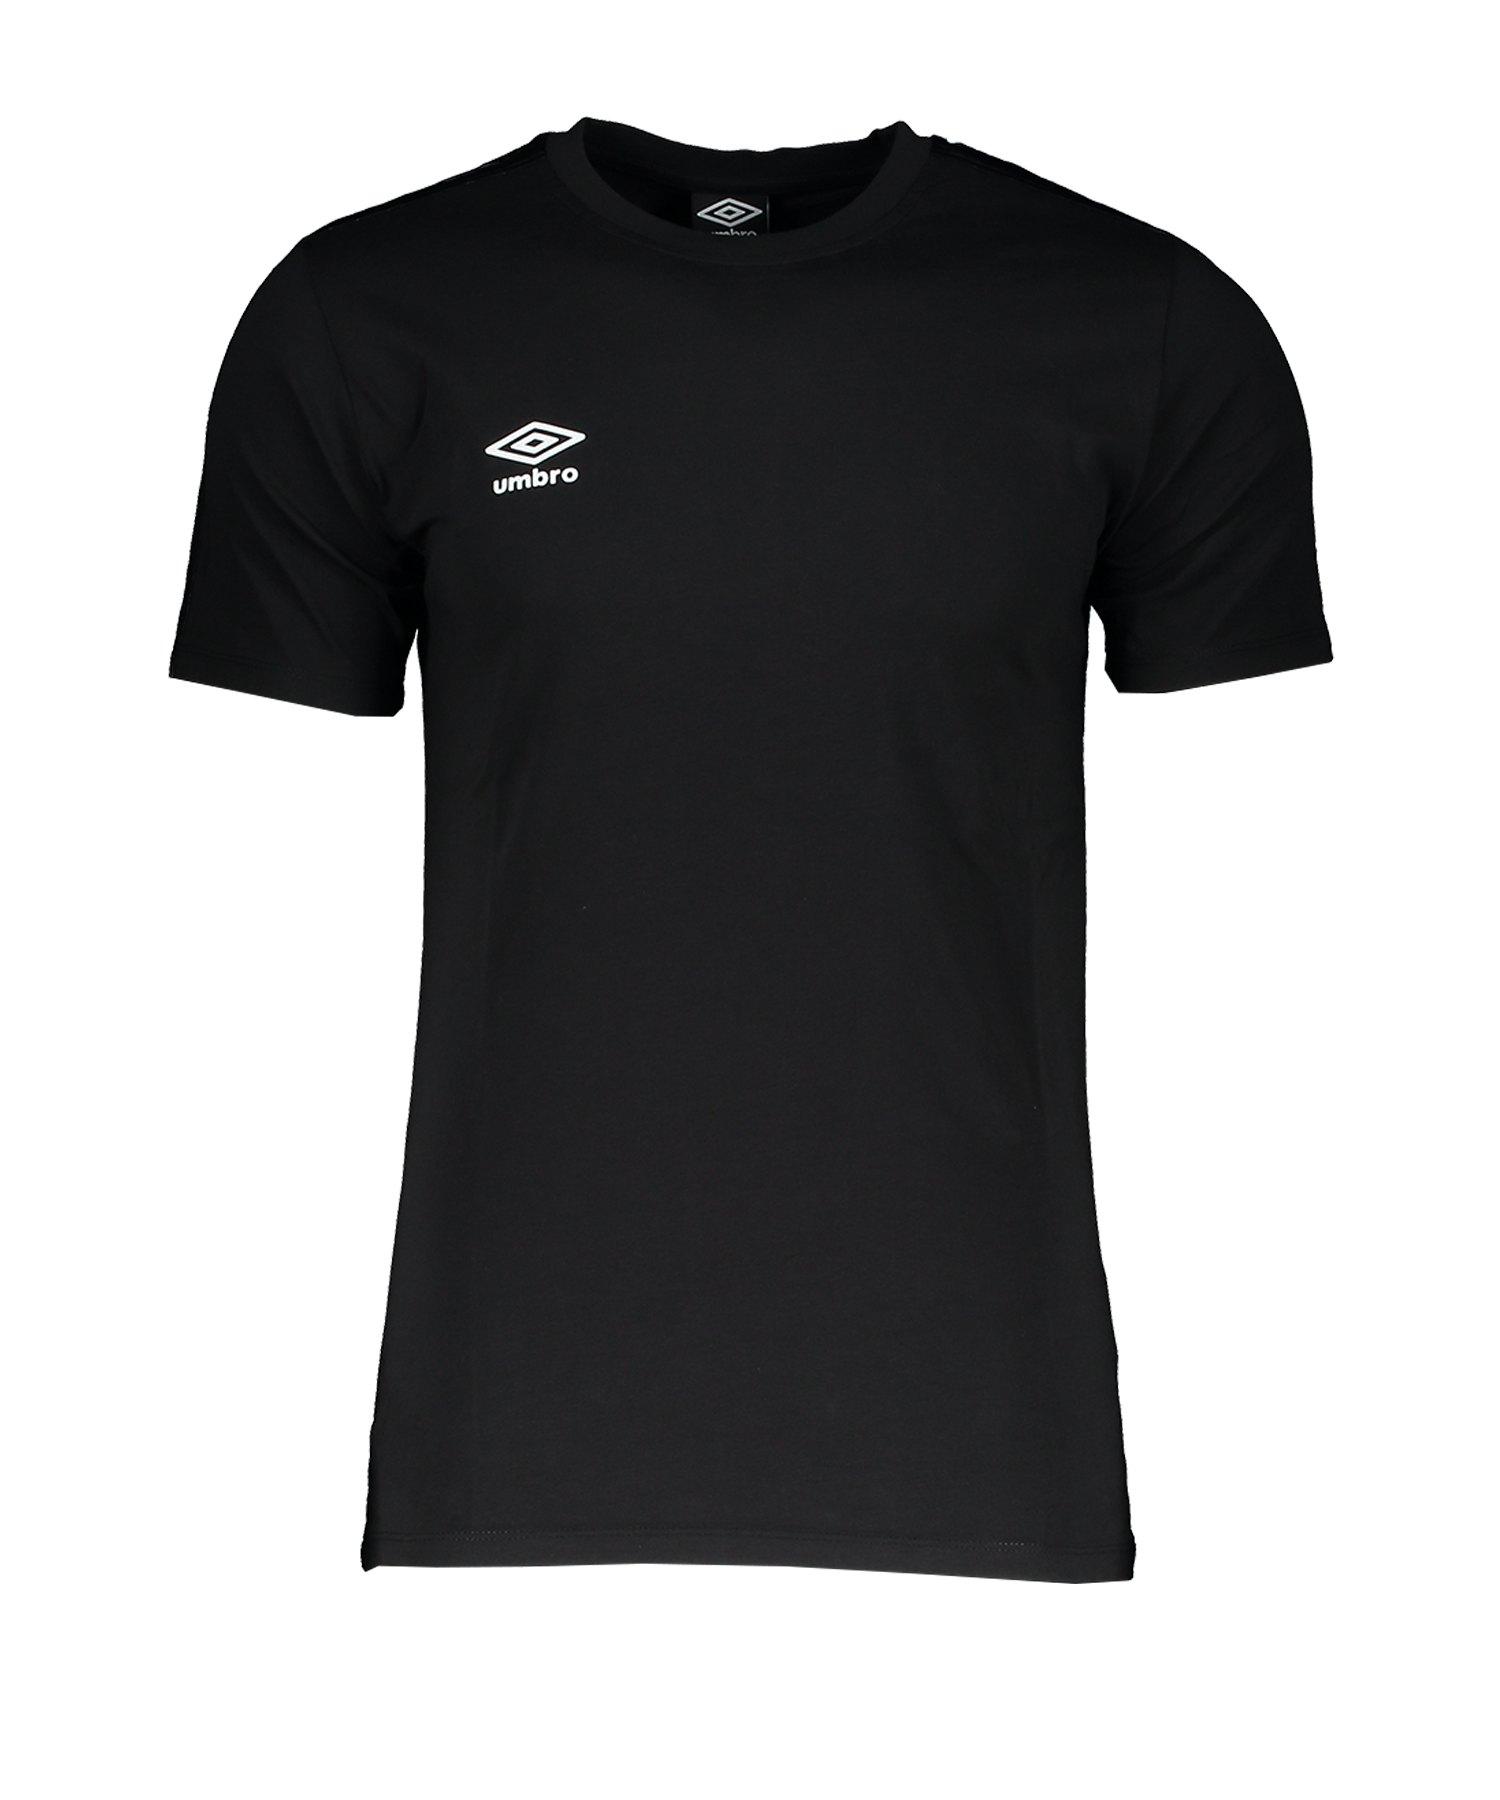 Umbro Pro Taped Tee T-Shirt Schwarz F060 - Schwarz